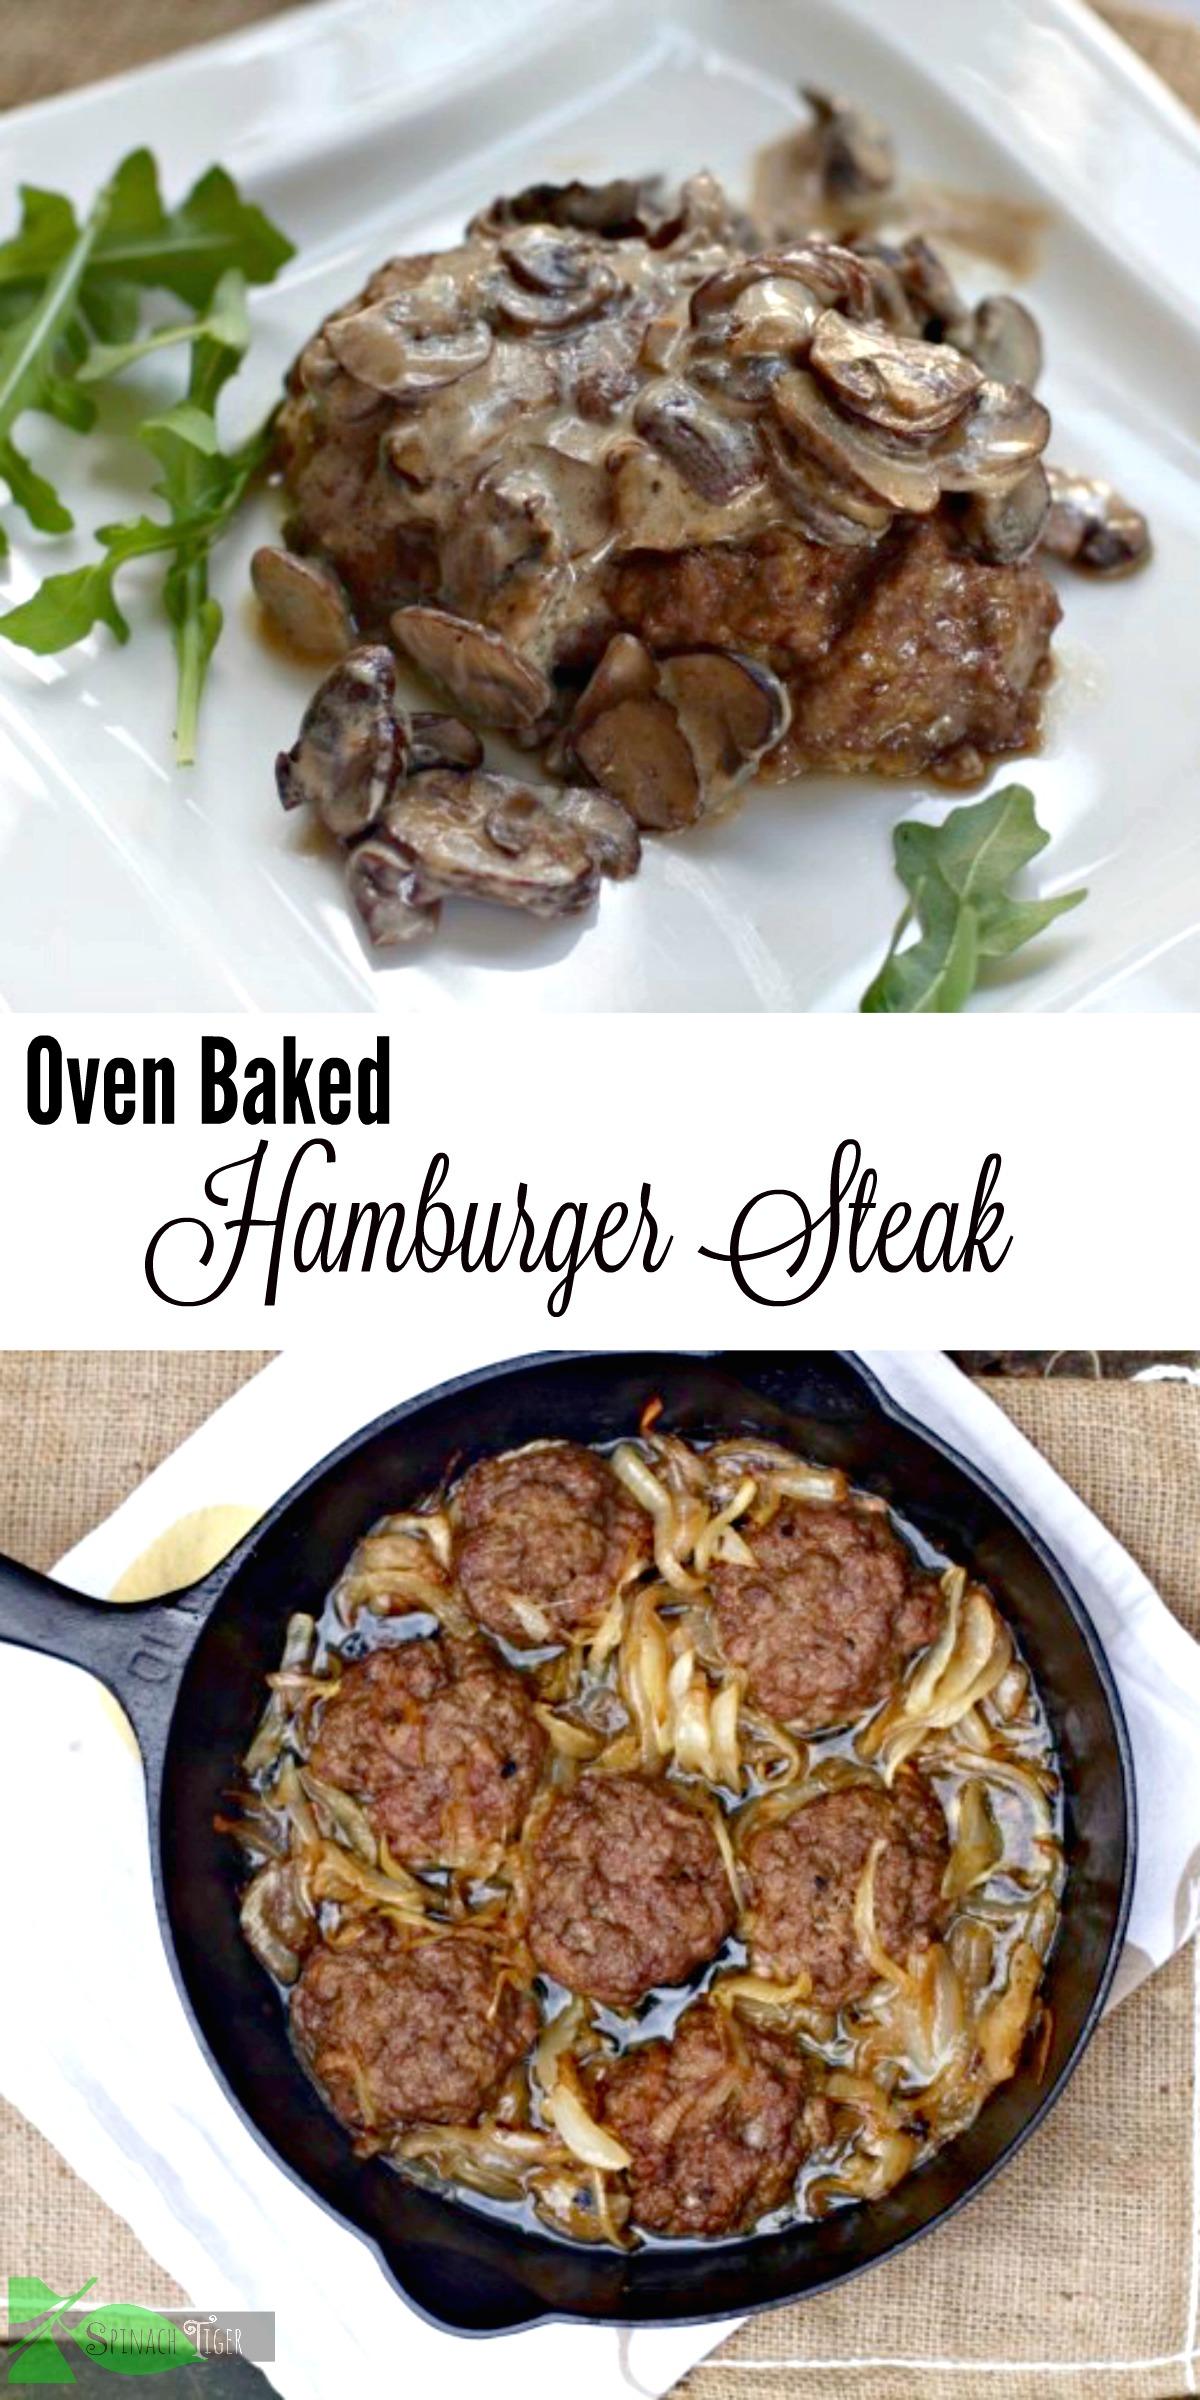 Oven Baked Hamburger Steaks with caramelized onions or mushroom. #ketodinner #groundbeef #spinachtiger #hamburger #hamburgersteaks #easydinner via @angelaroberts